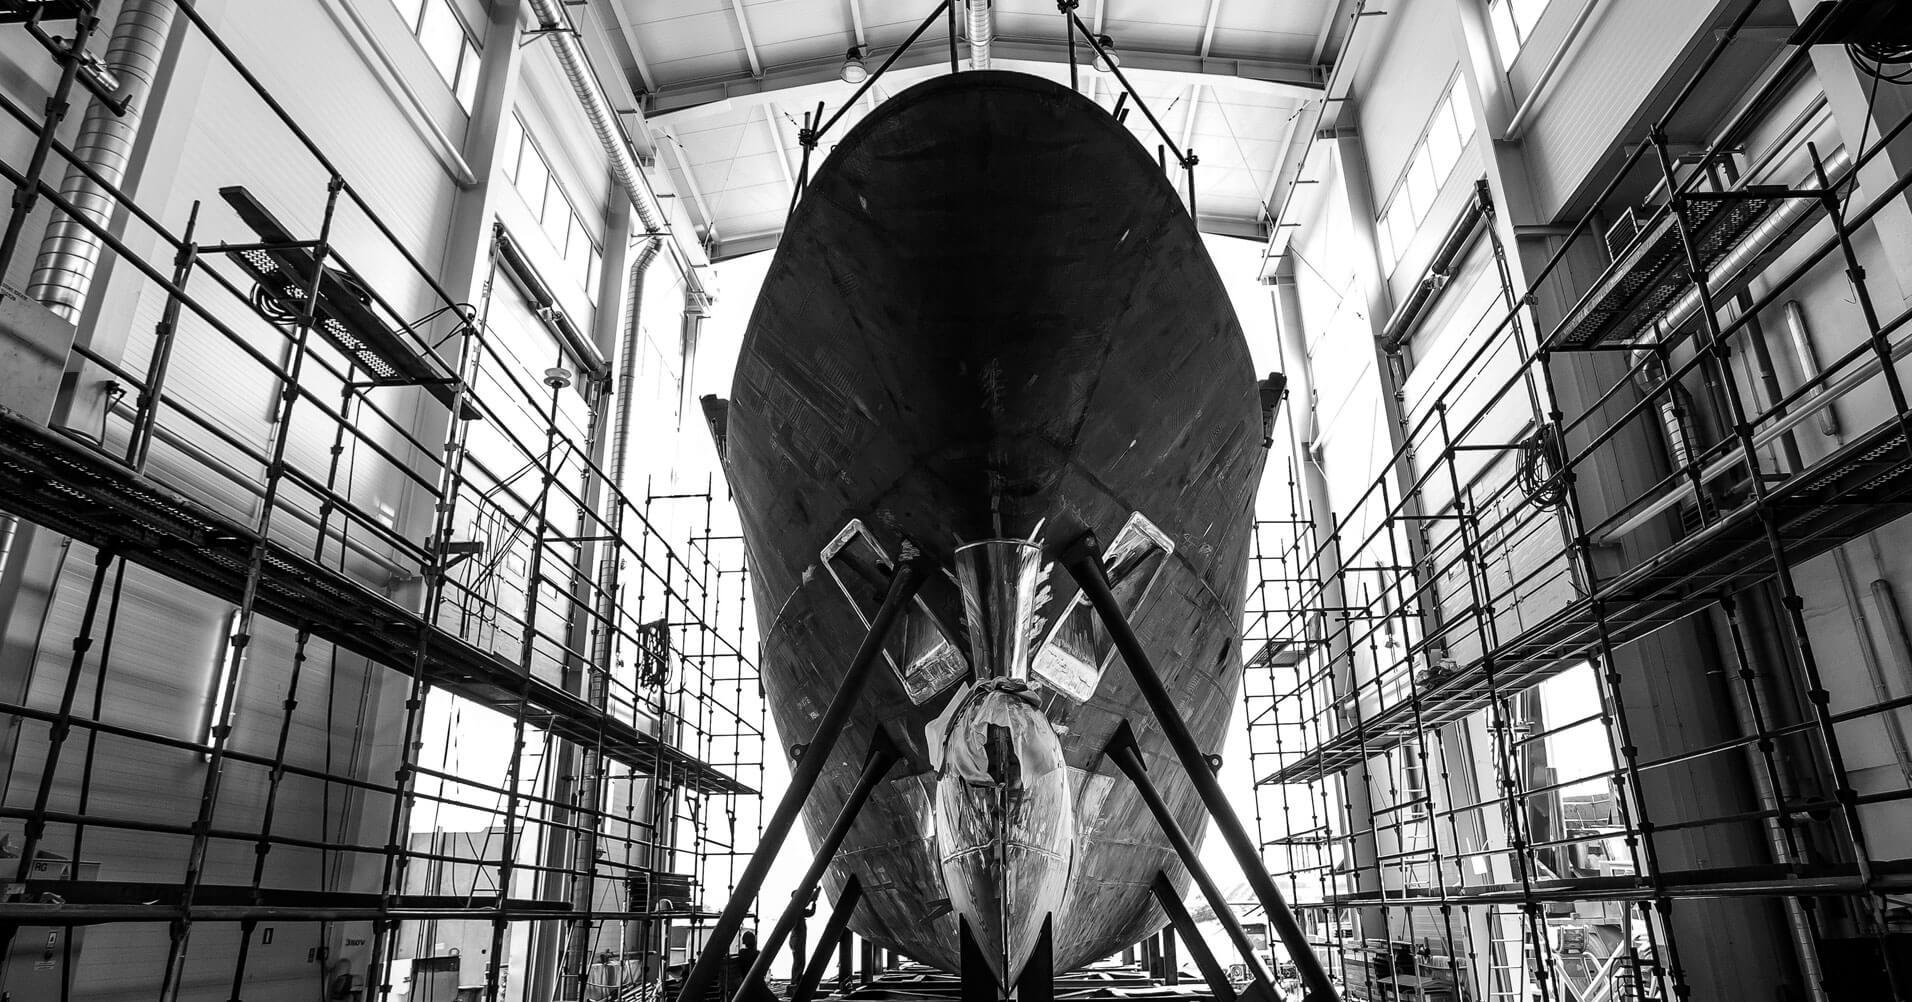 Mediterranean Shipyard